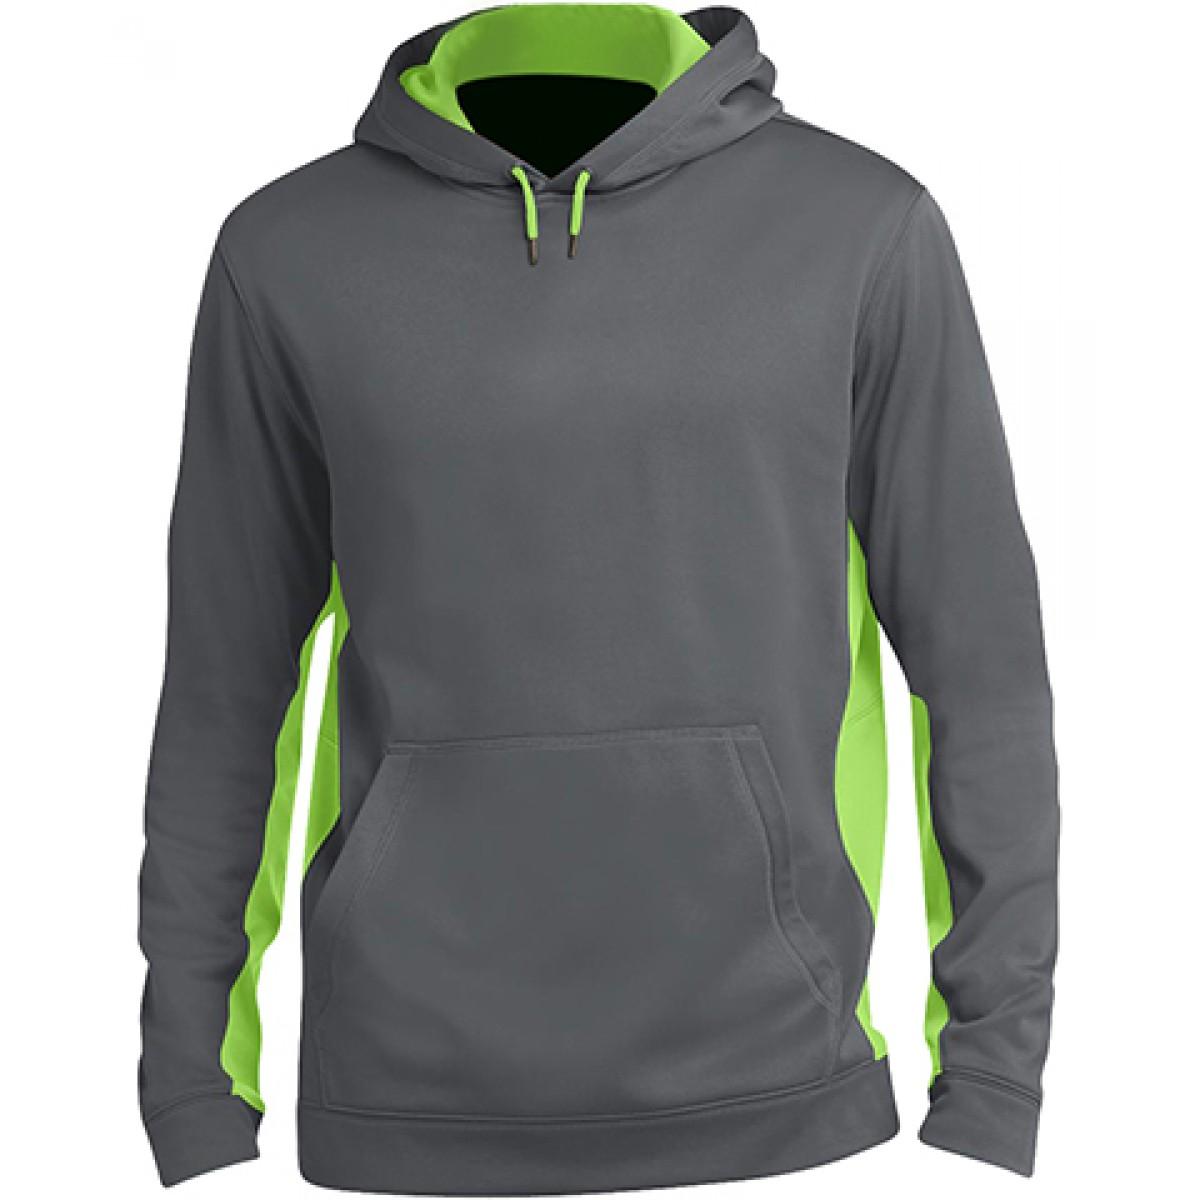 Fleece Colorblock Hooded Pullover-Gray/Green-2XL